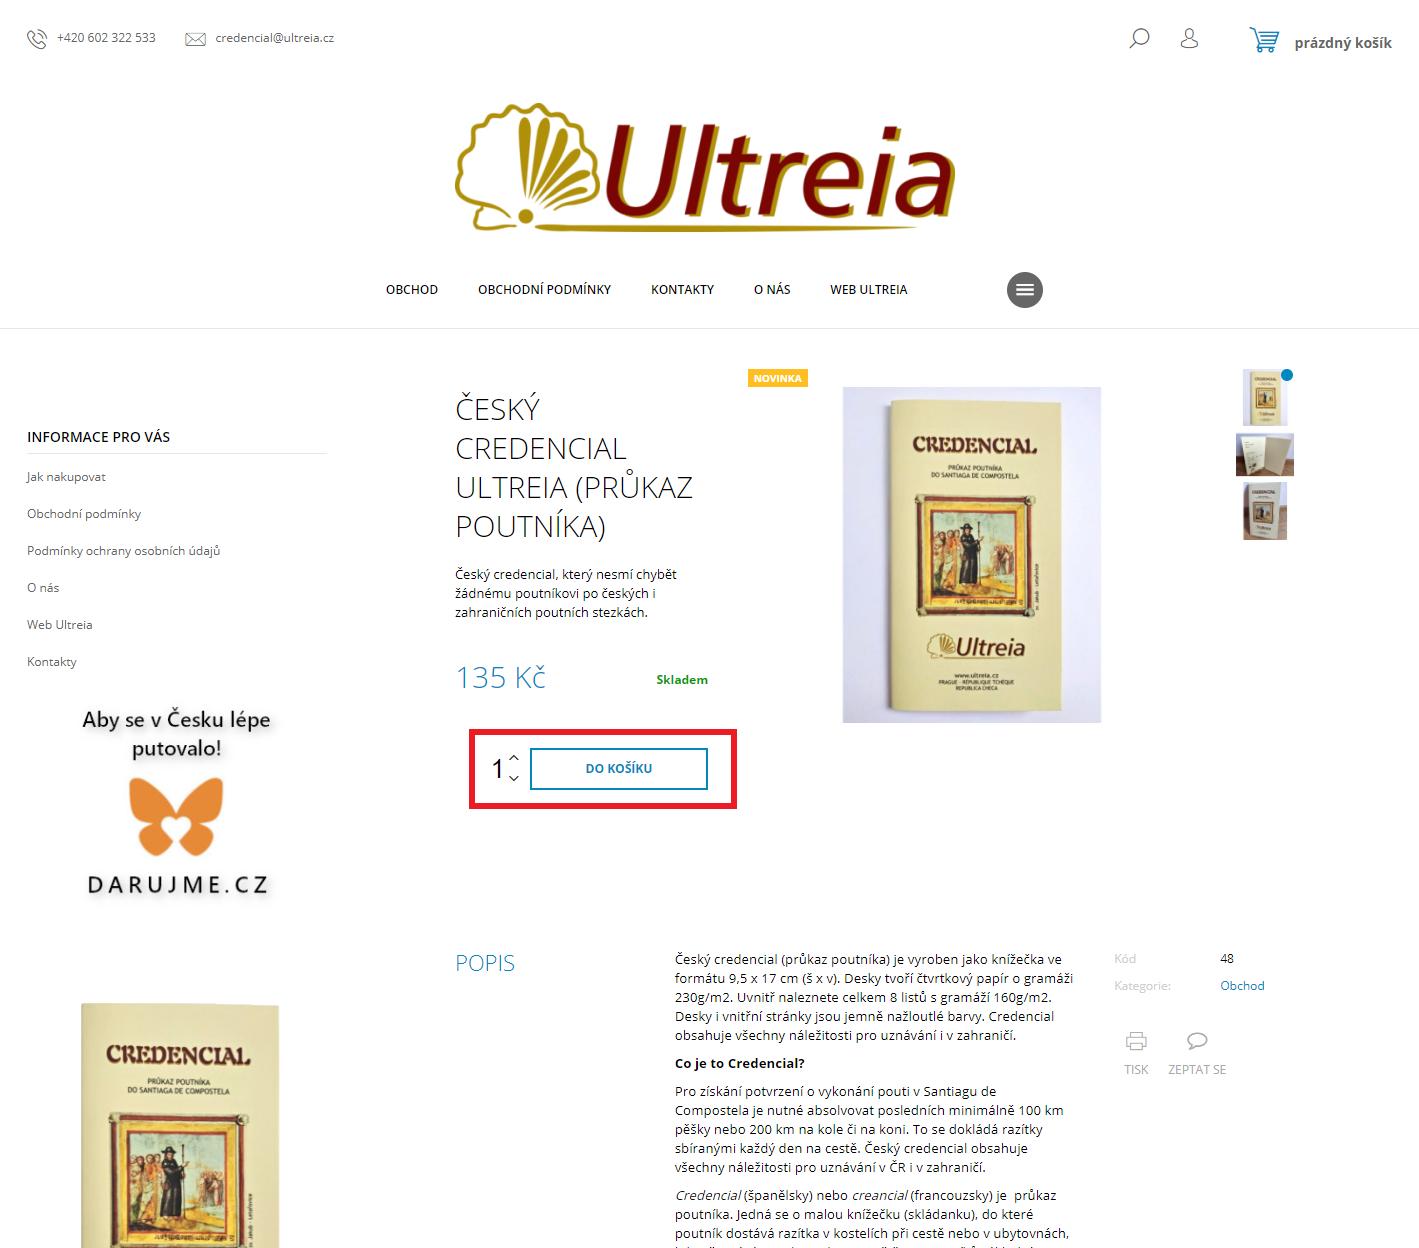 ultreia_03